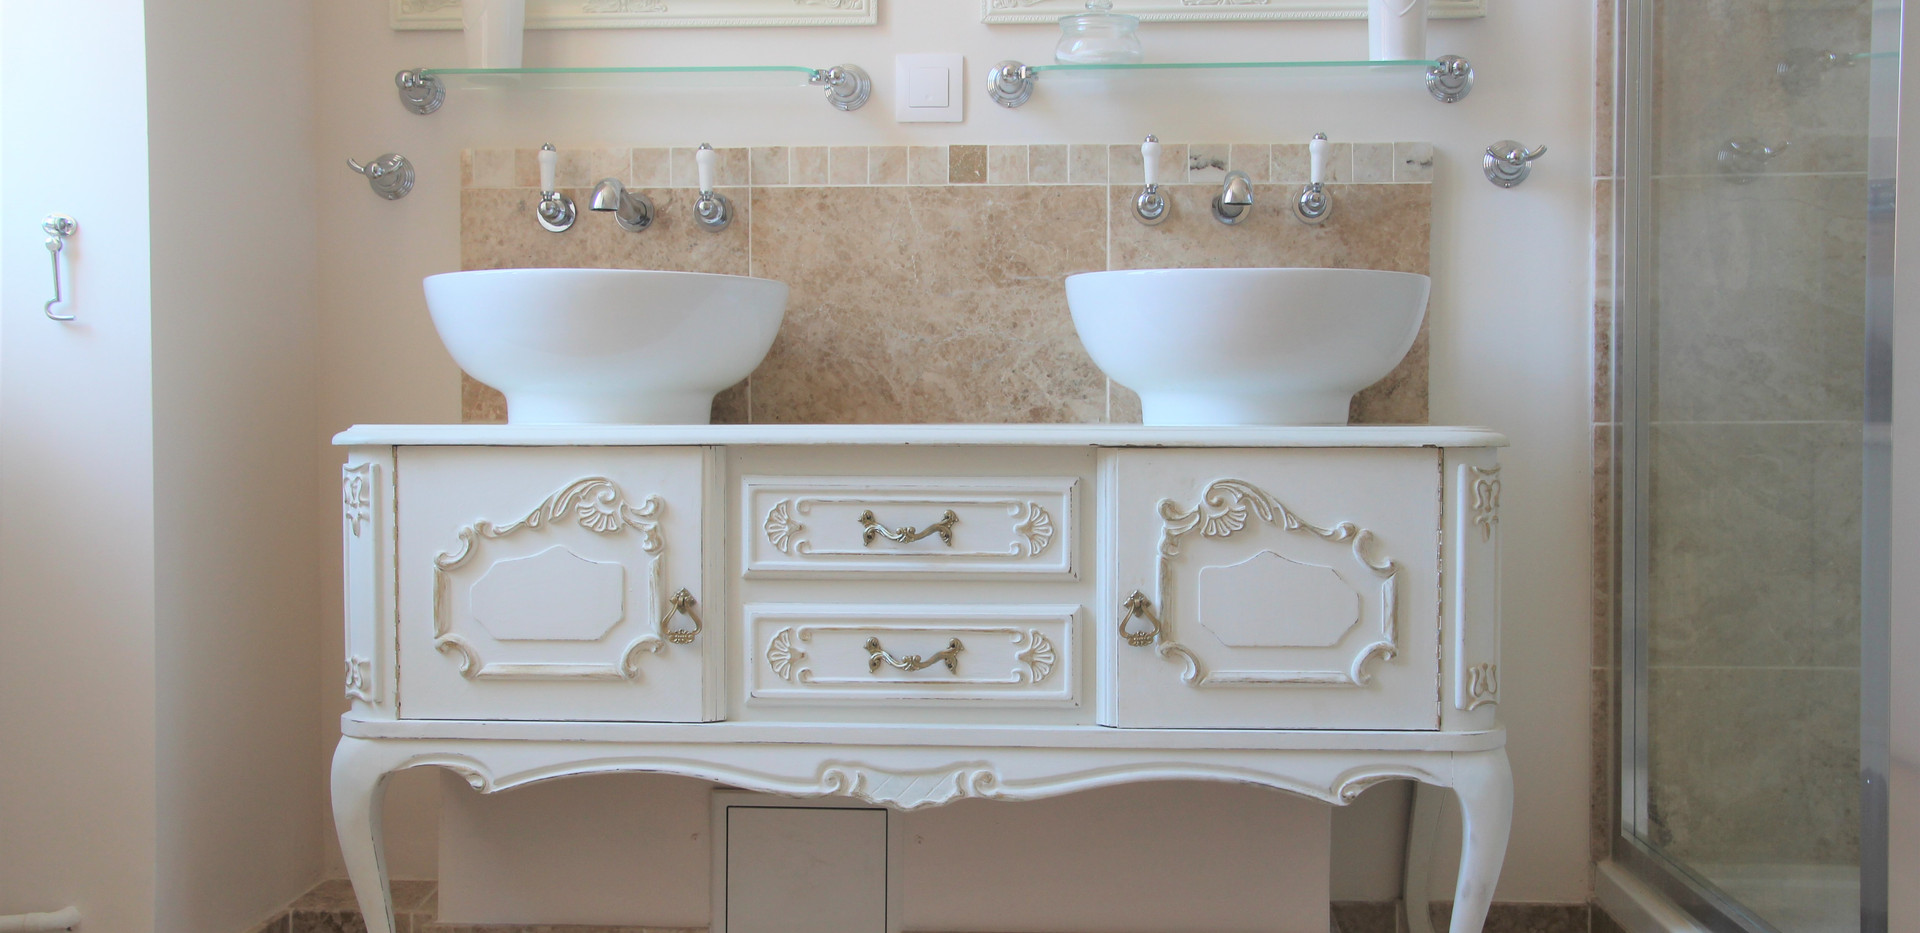 Family Bathroom - Louis XV Sinks